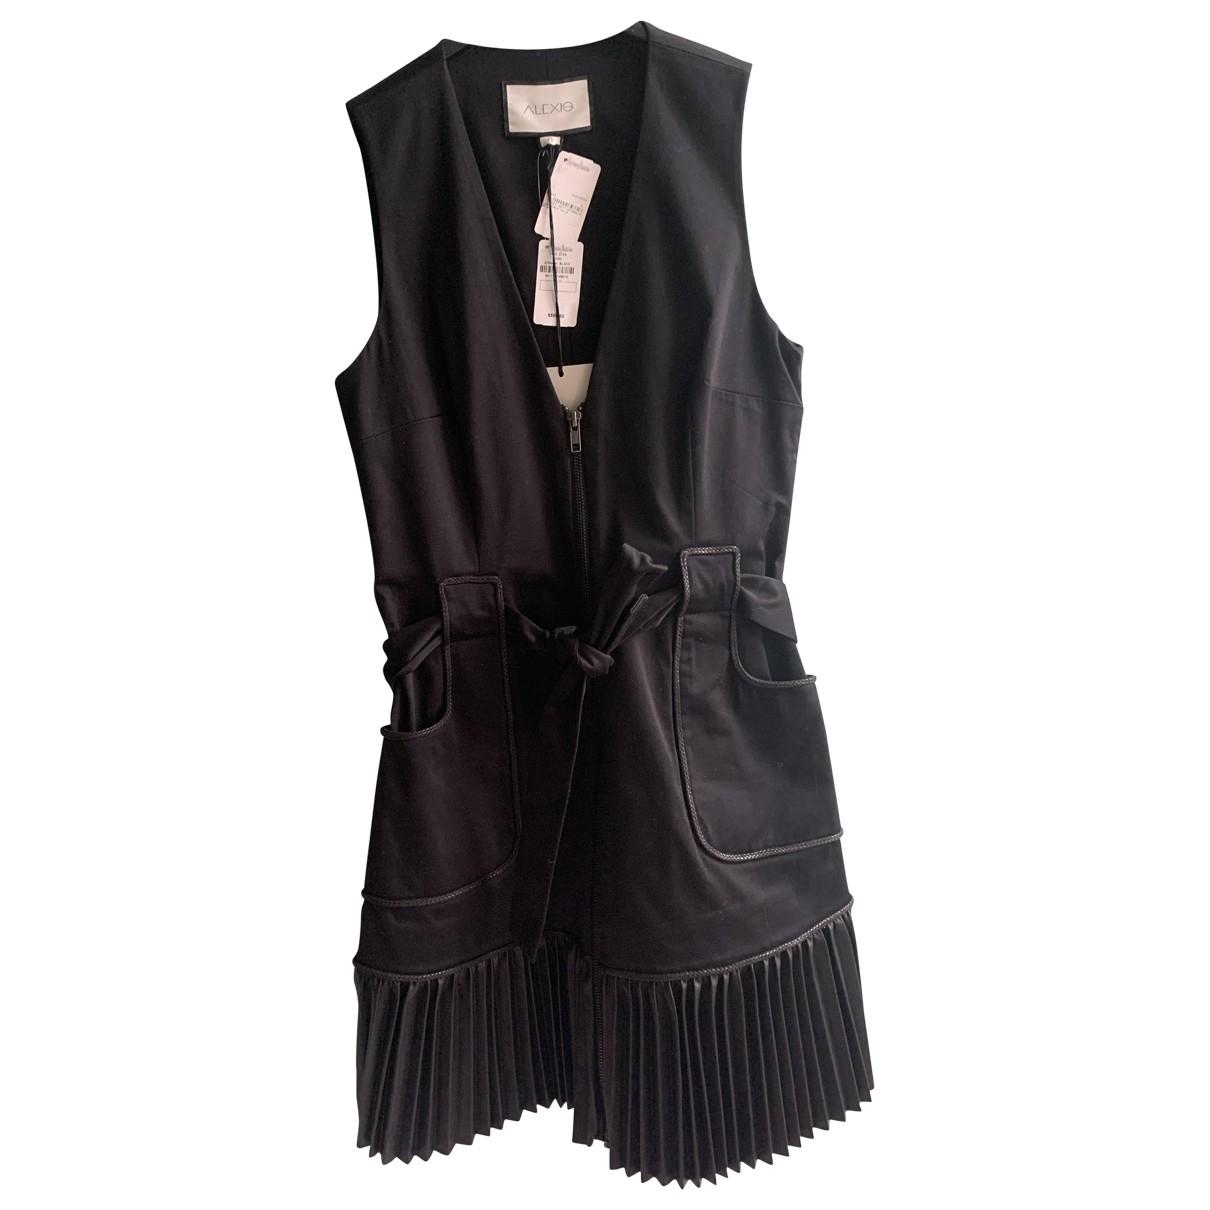 Alexis \N Black Cotton dress for Women 0 0-5